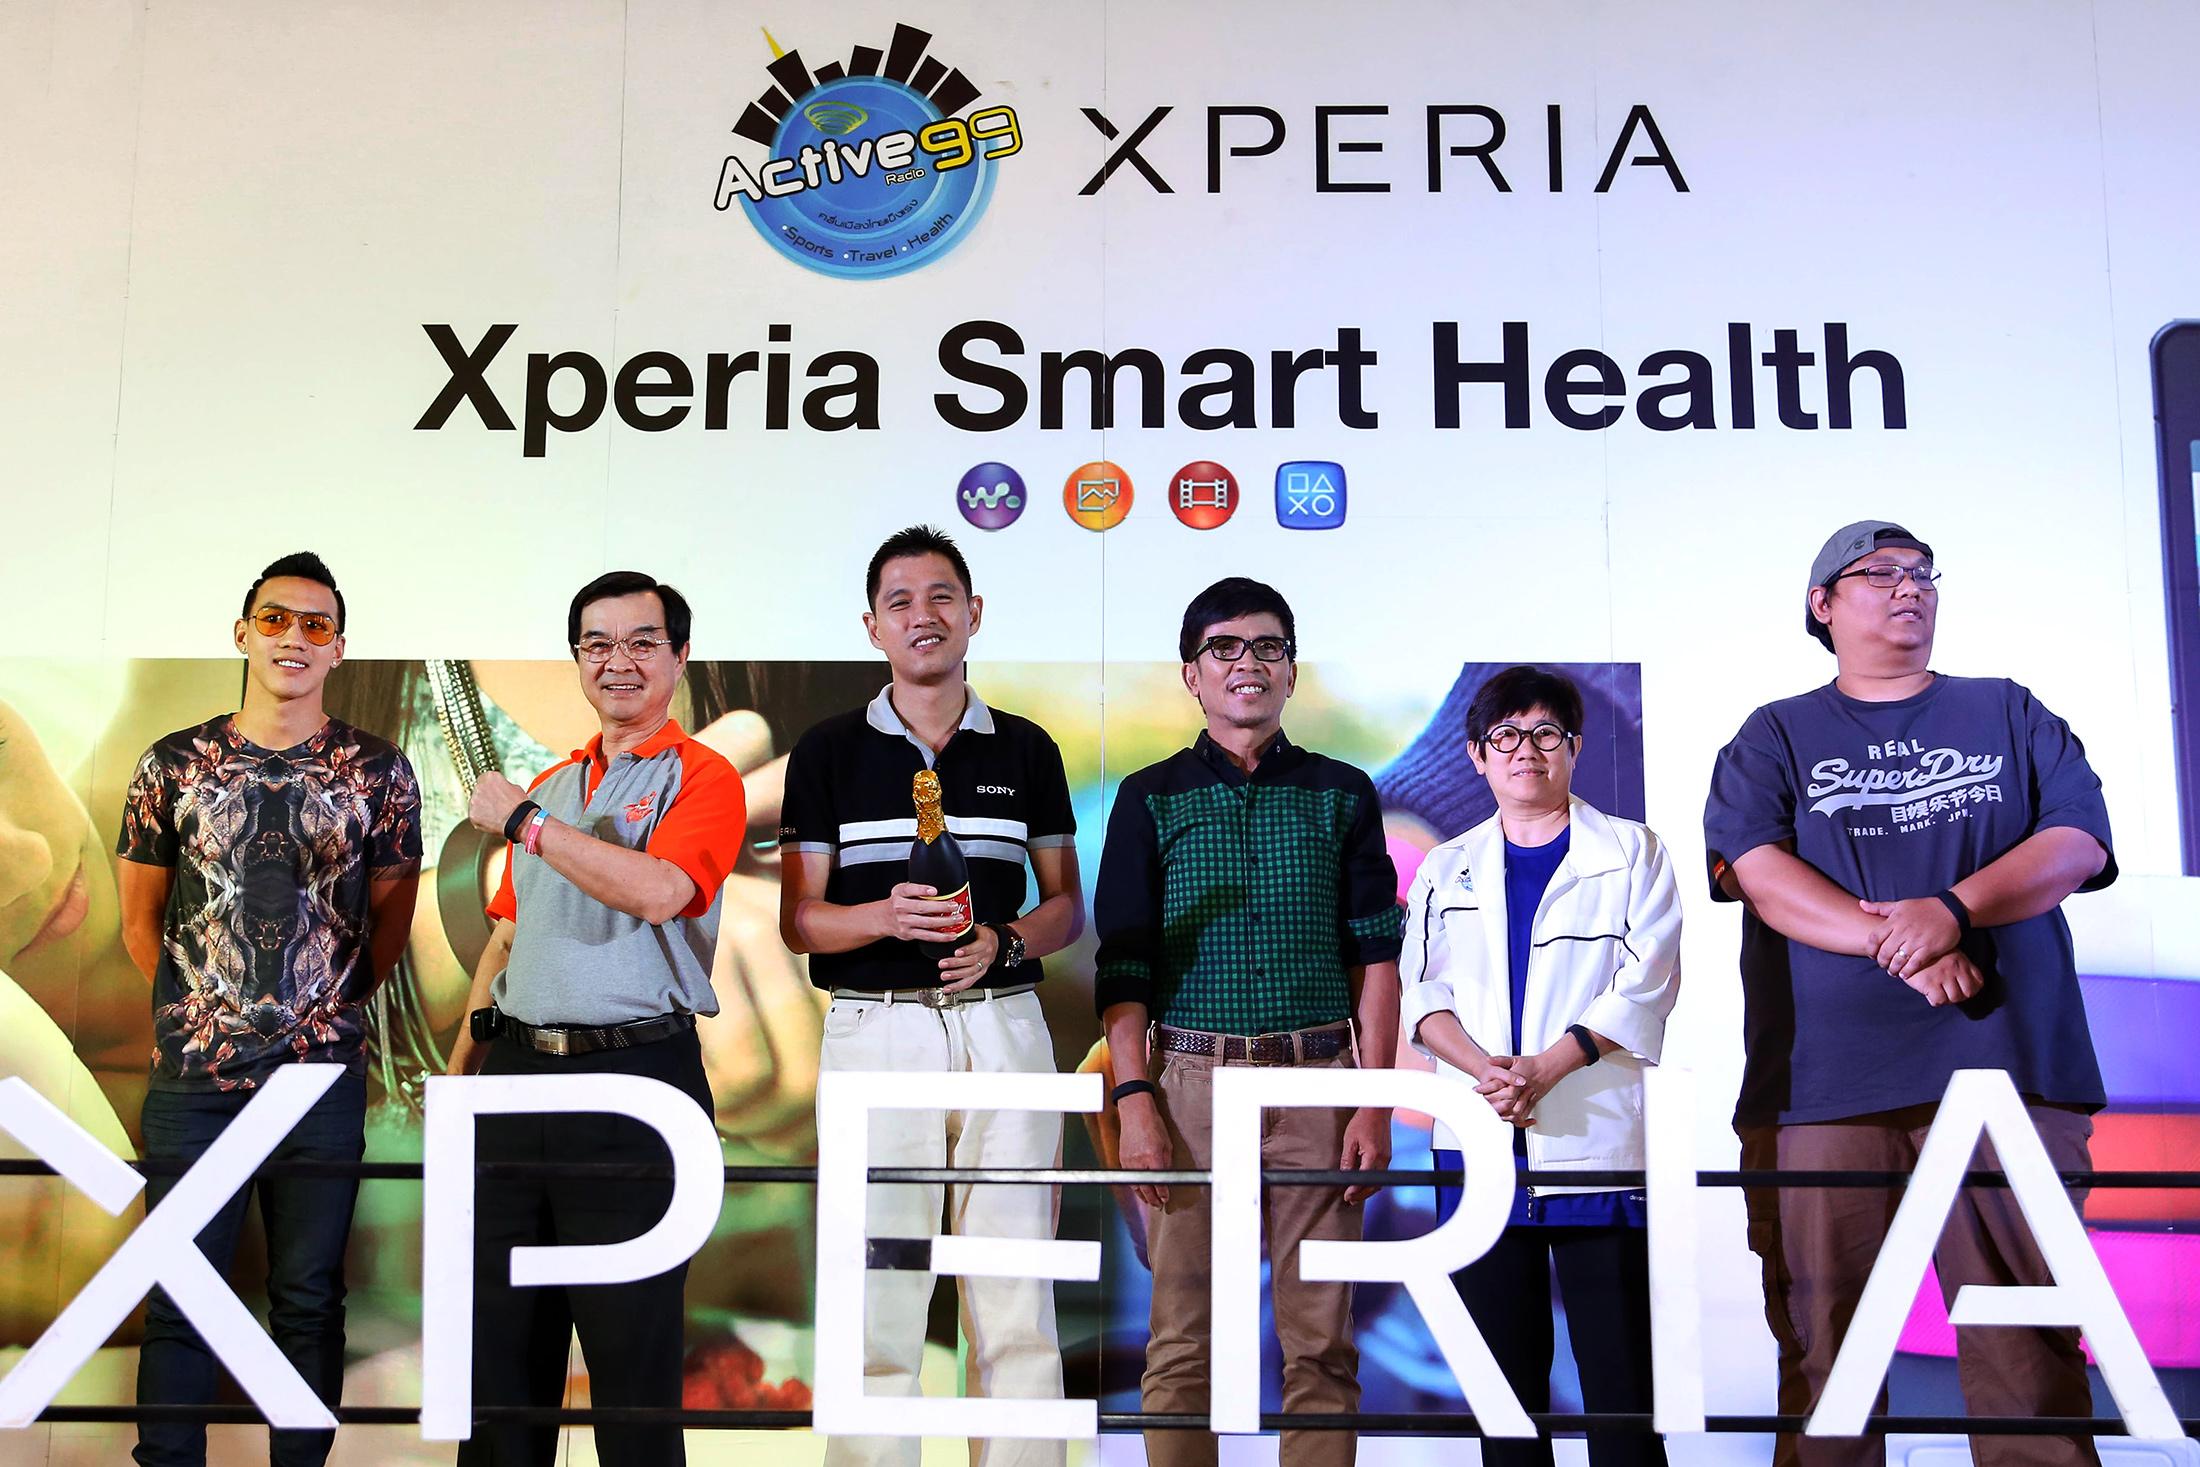 Xperia-Smart-Health_1